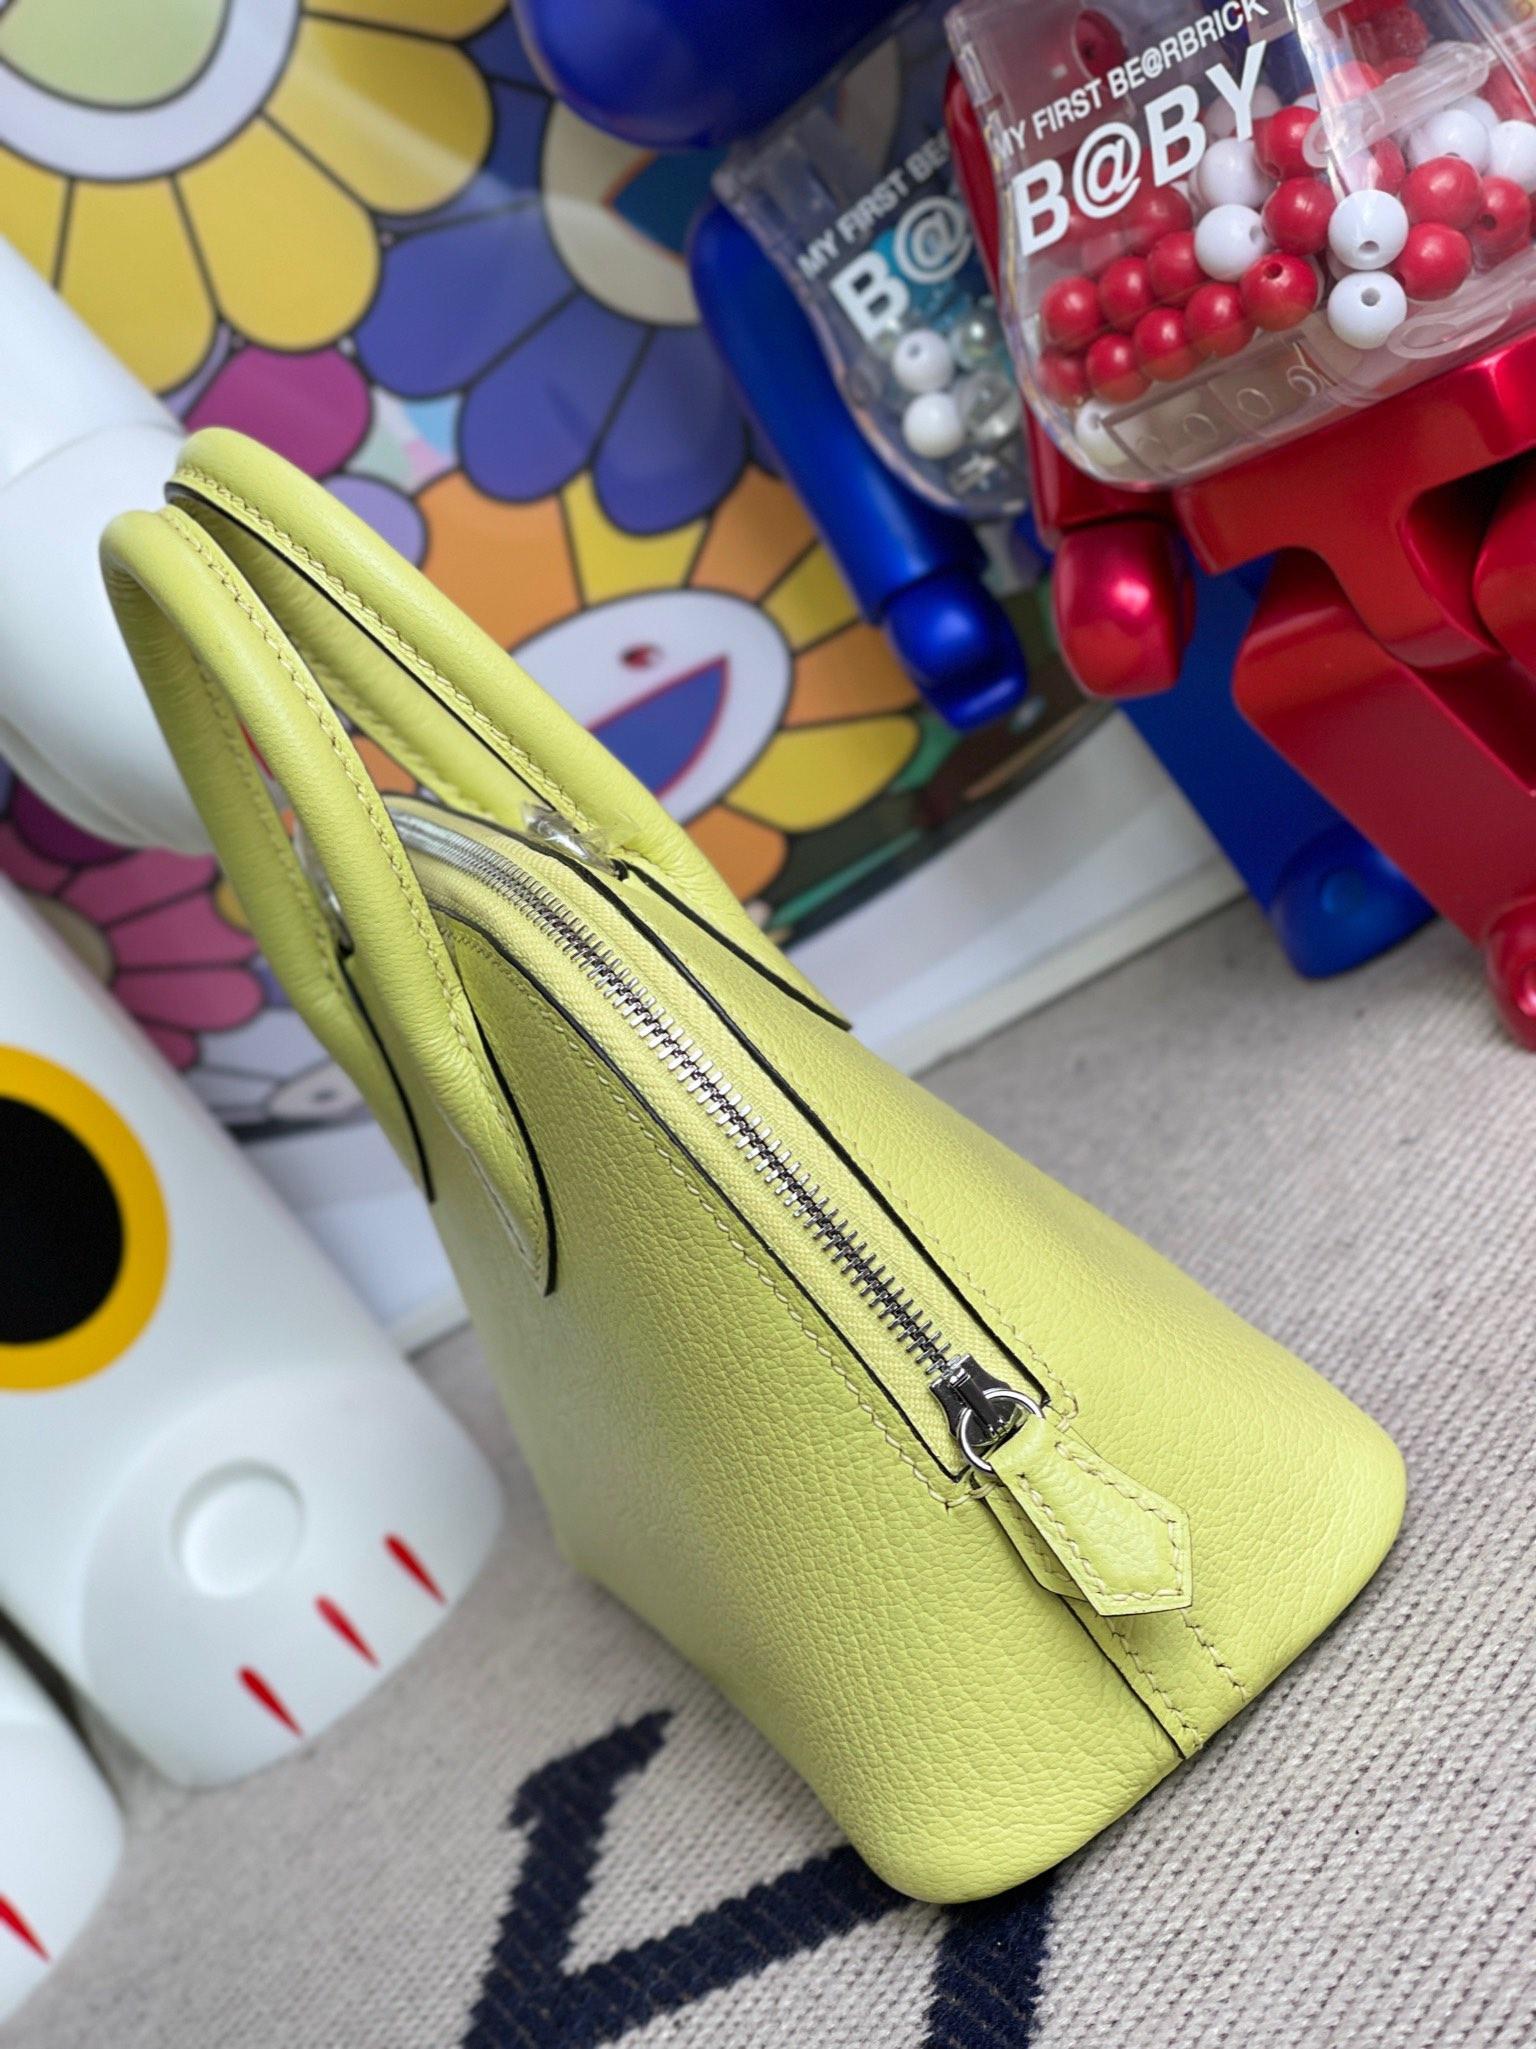 Hermès(爱马仕)Mini bolide 迷你保龄球包 chevre 山羊皮 R9 嫩芽绿 银扣 顶级手缝